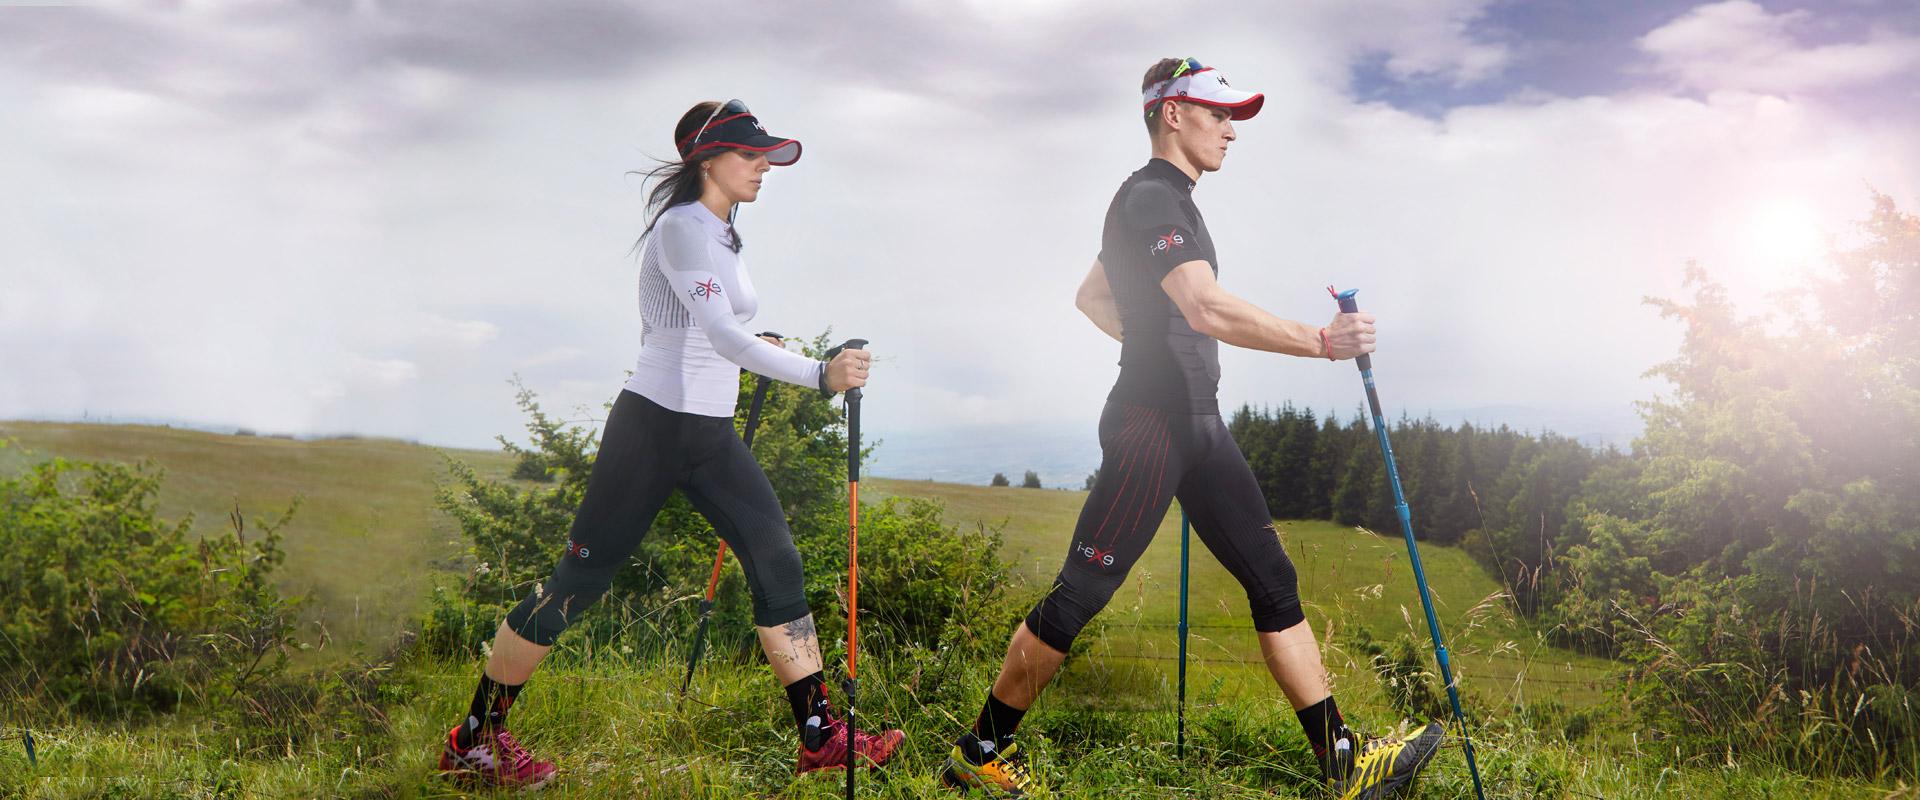 Trekking - Nordic Walking